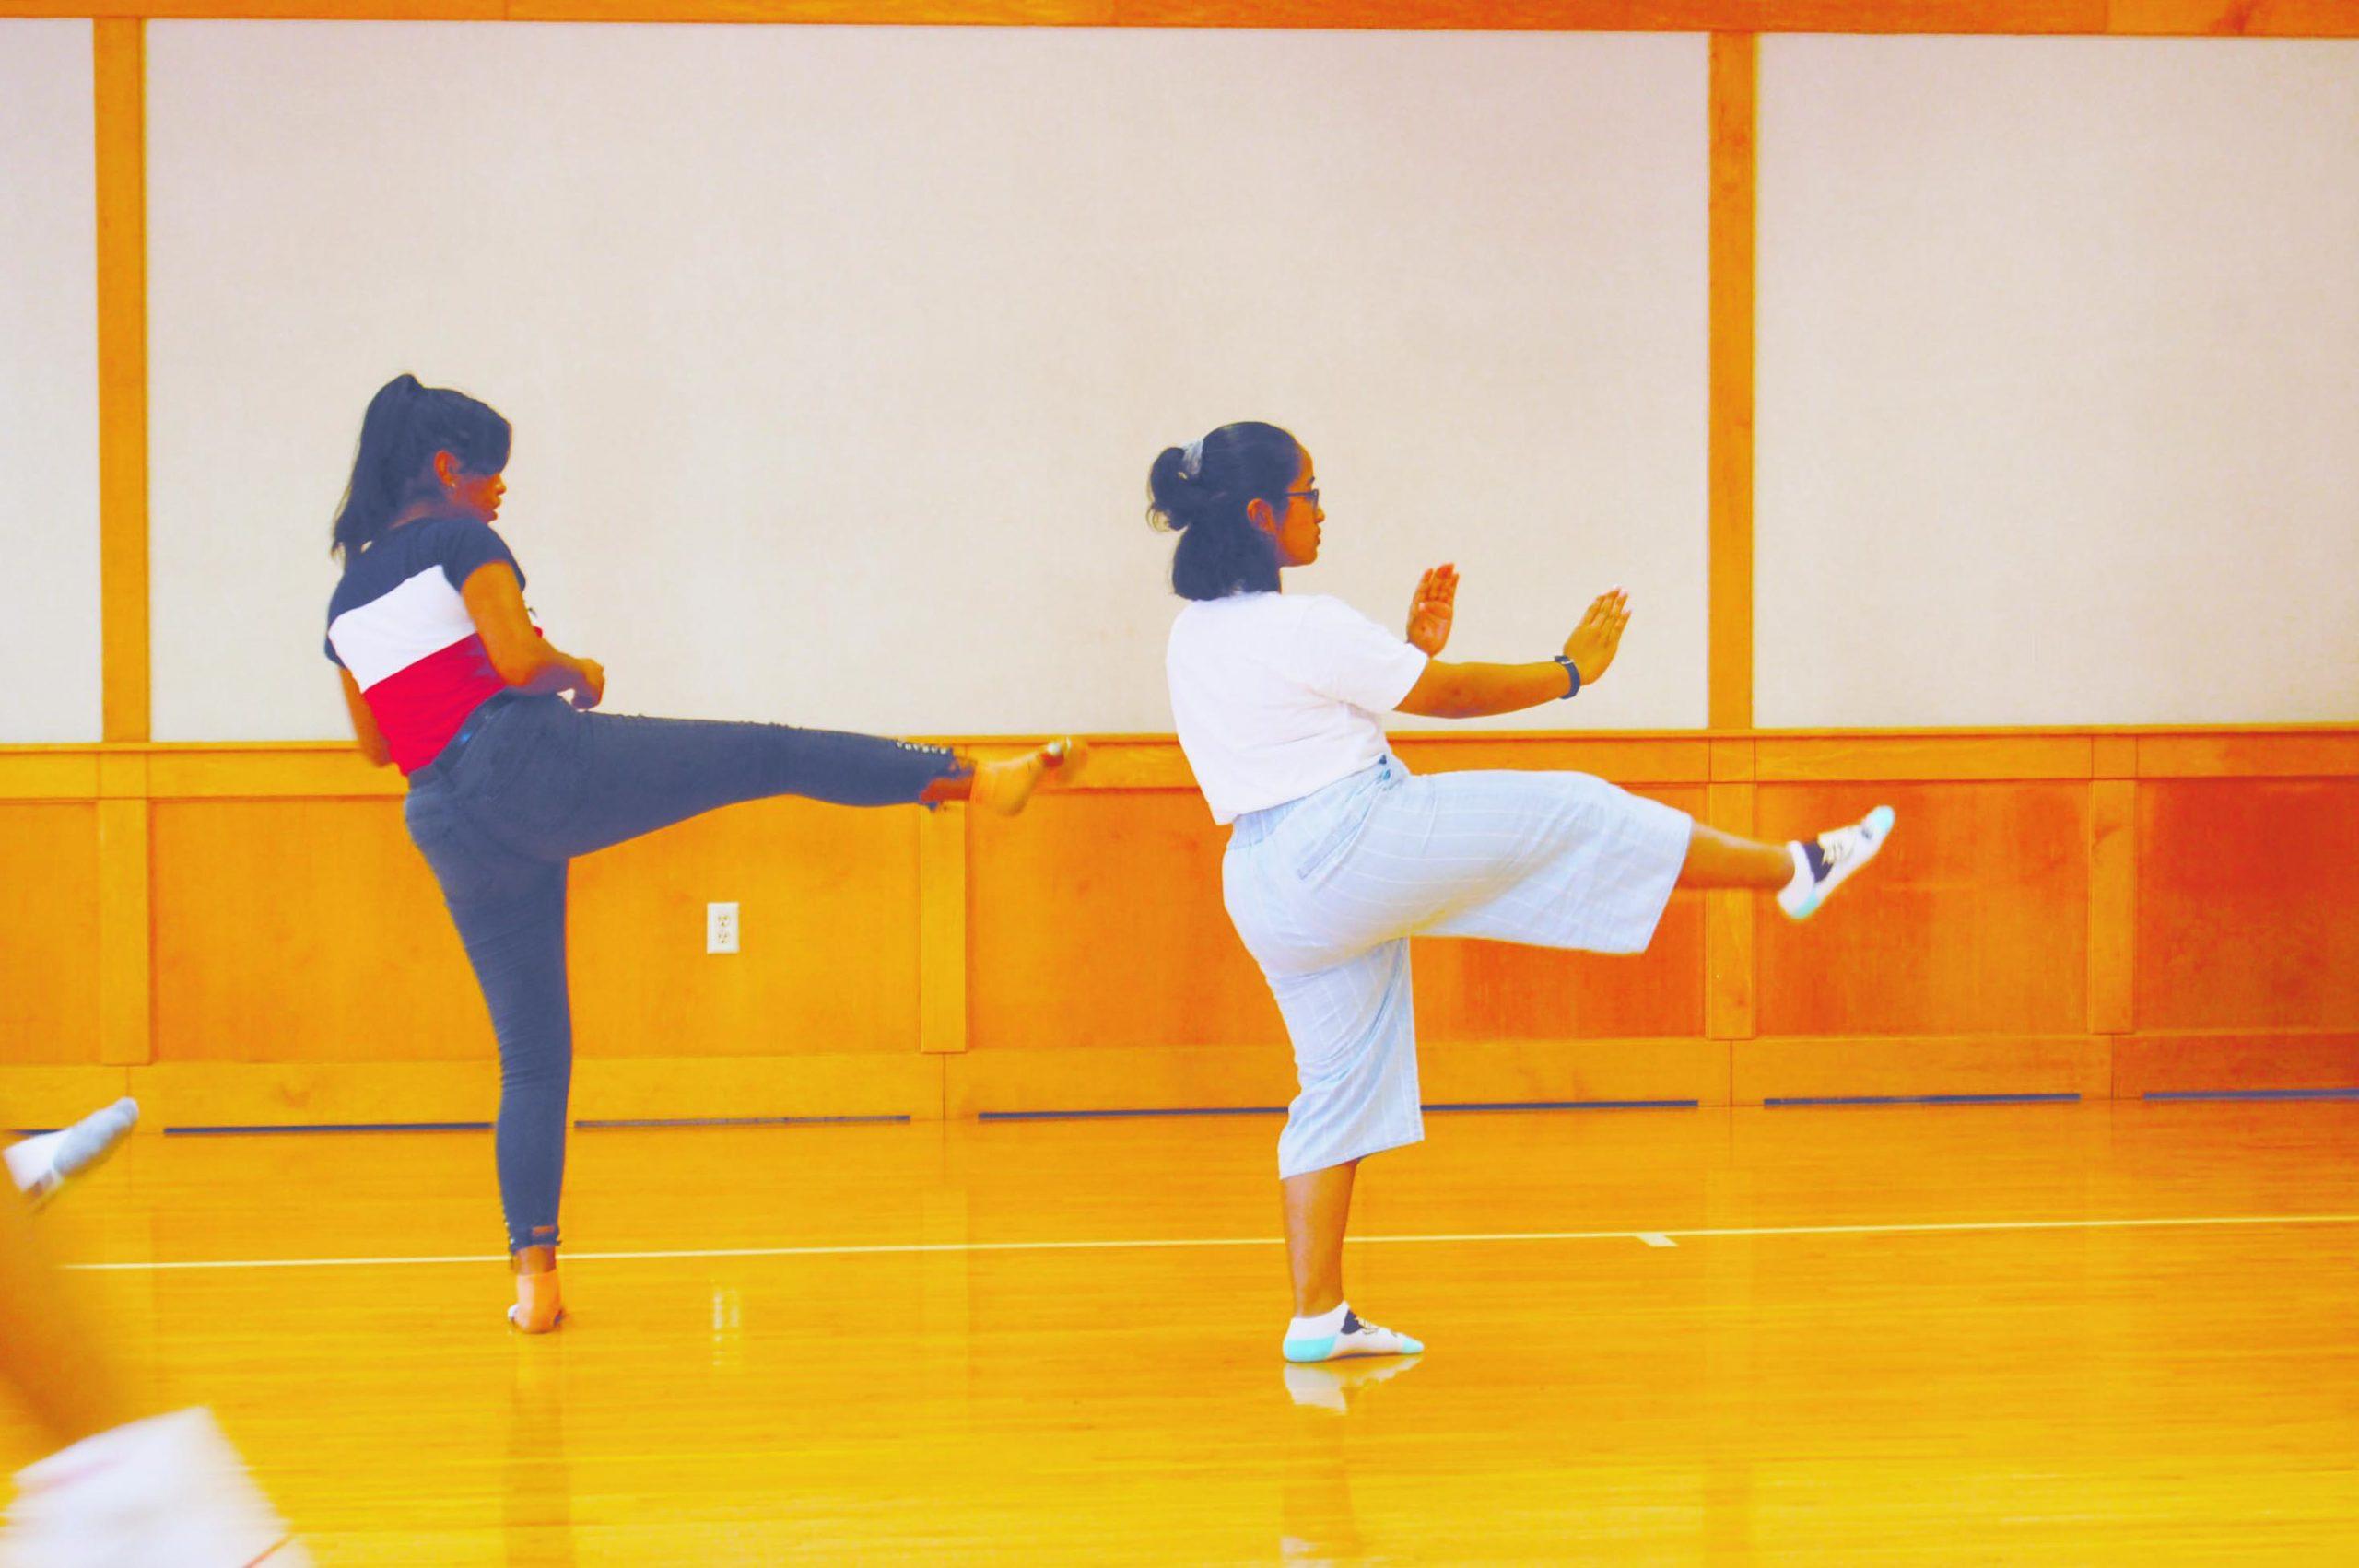 """Oss!"" Sharlene Bright (left) and Leilah Eusebio from Washington Middle School practiced karate kicks that were taught to them by Jordan Silva-Sensei of the Japan International Karate Center."